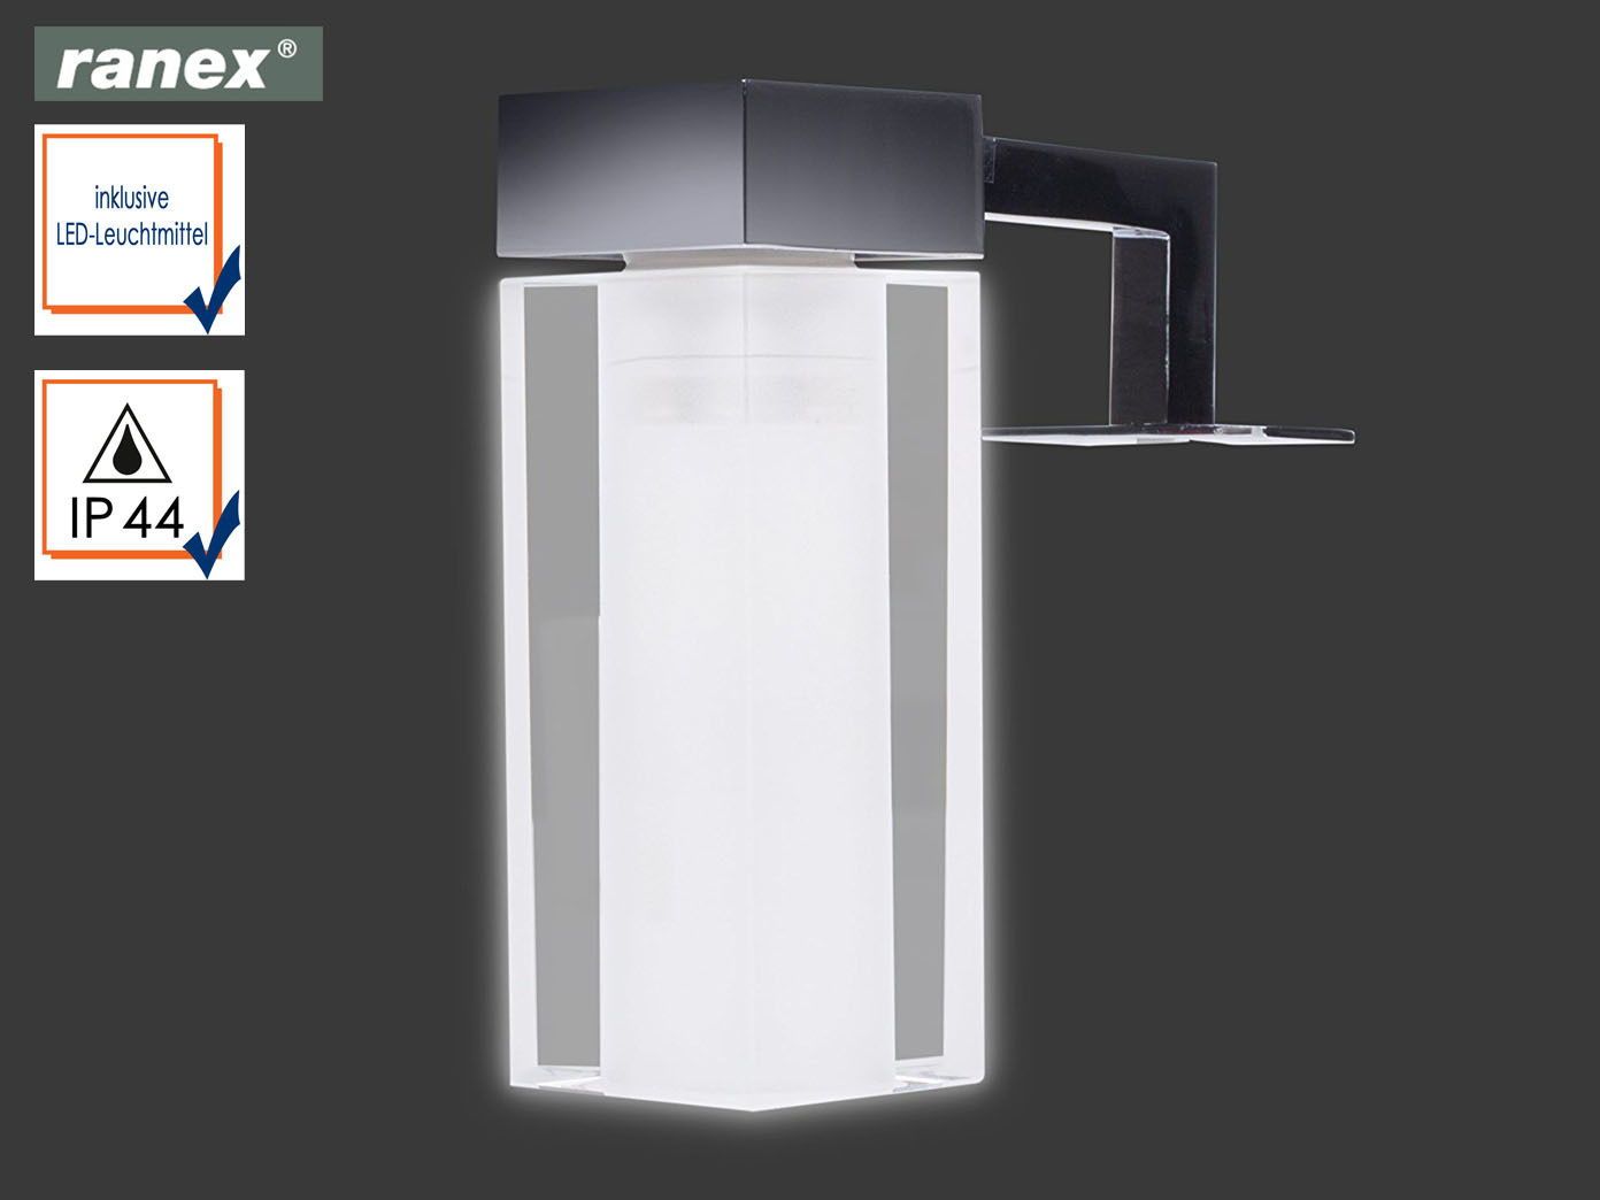 led badleuchte spiegellampe mit glas lampenschirm. Black Bedroom Furniture Sets. Home Design Ideas